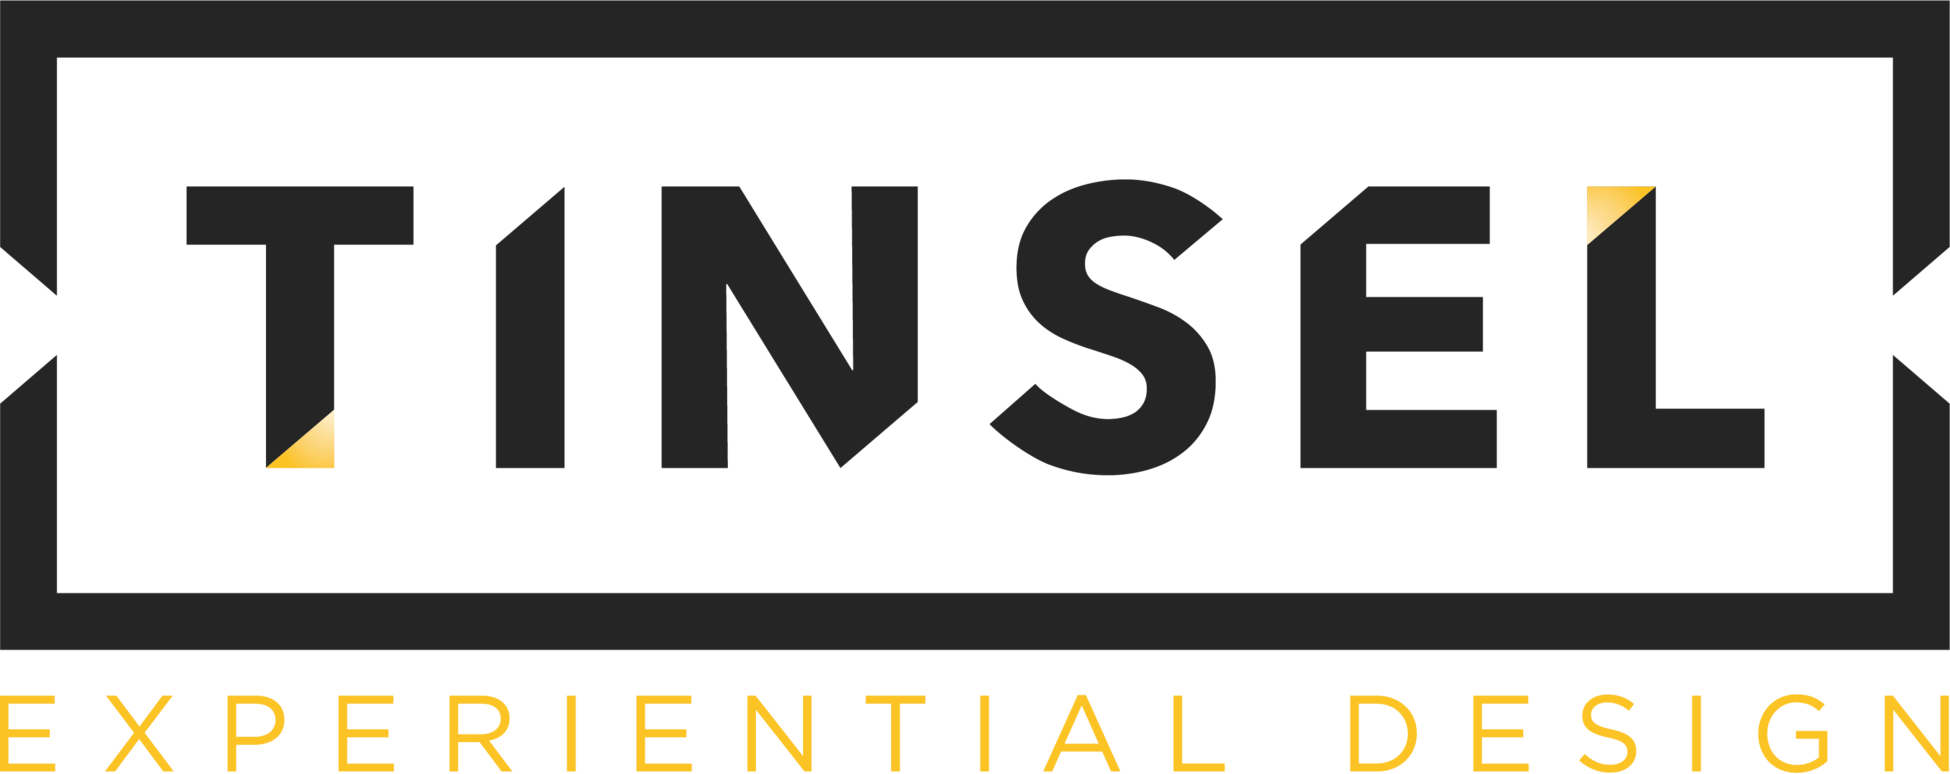 Tinsel Experientiatl Design.png